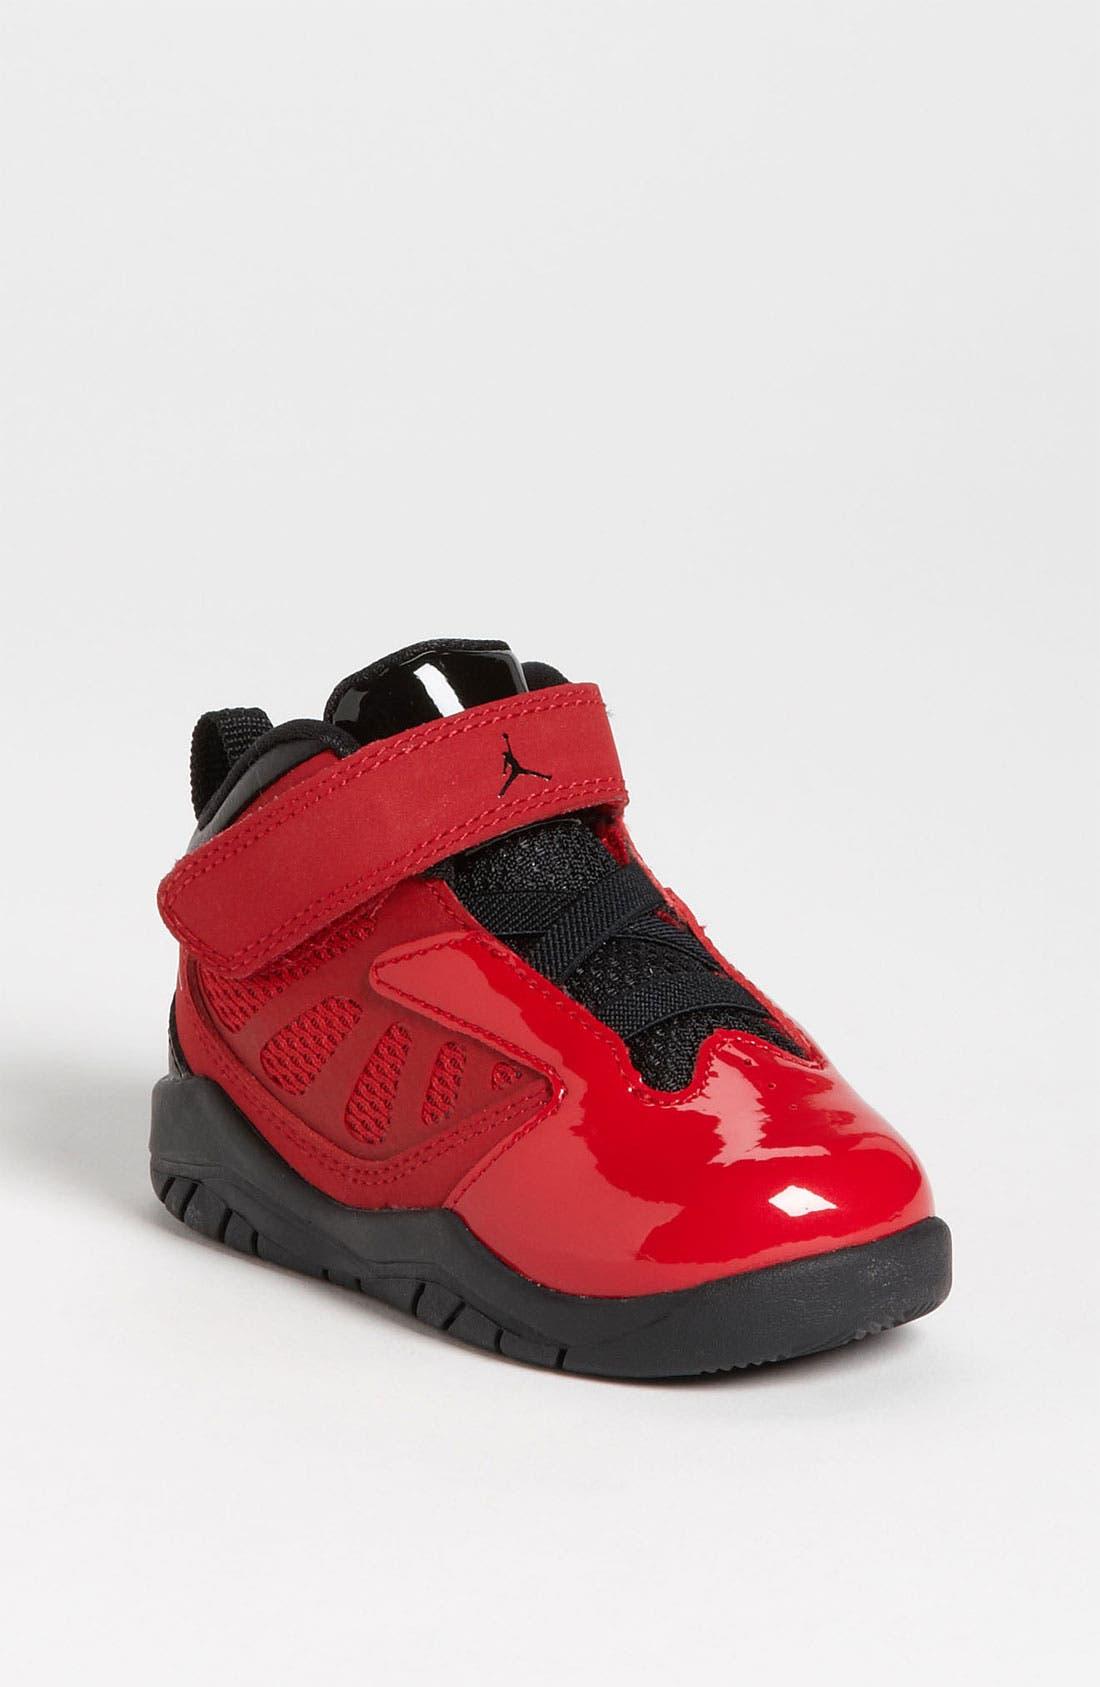 nike jordan shoes for baby